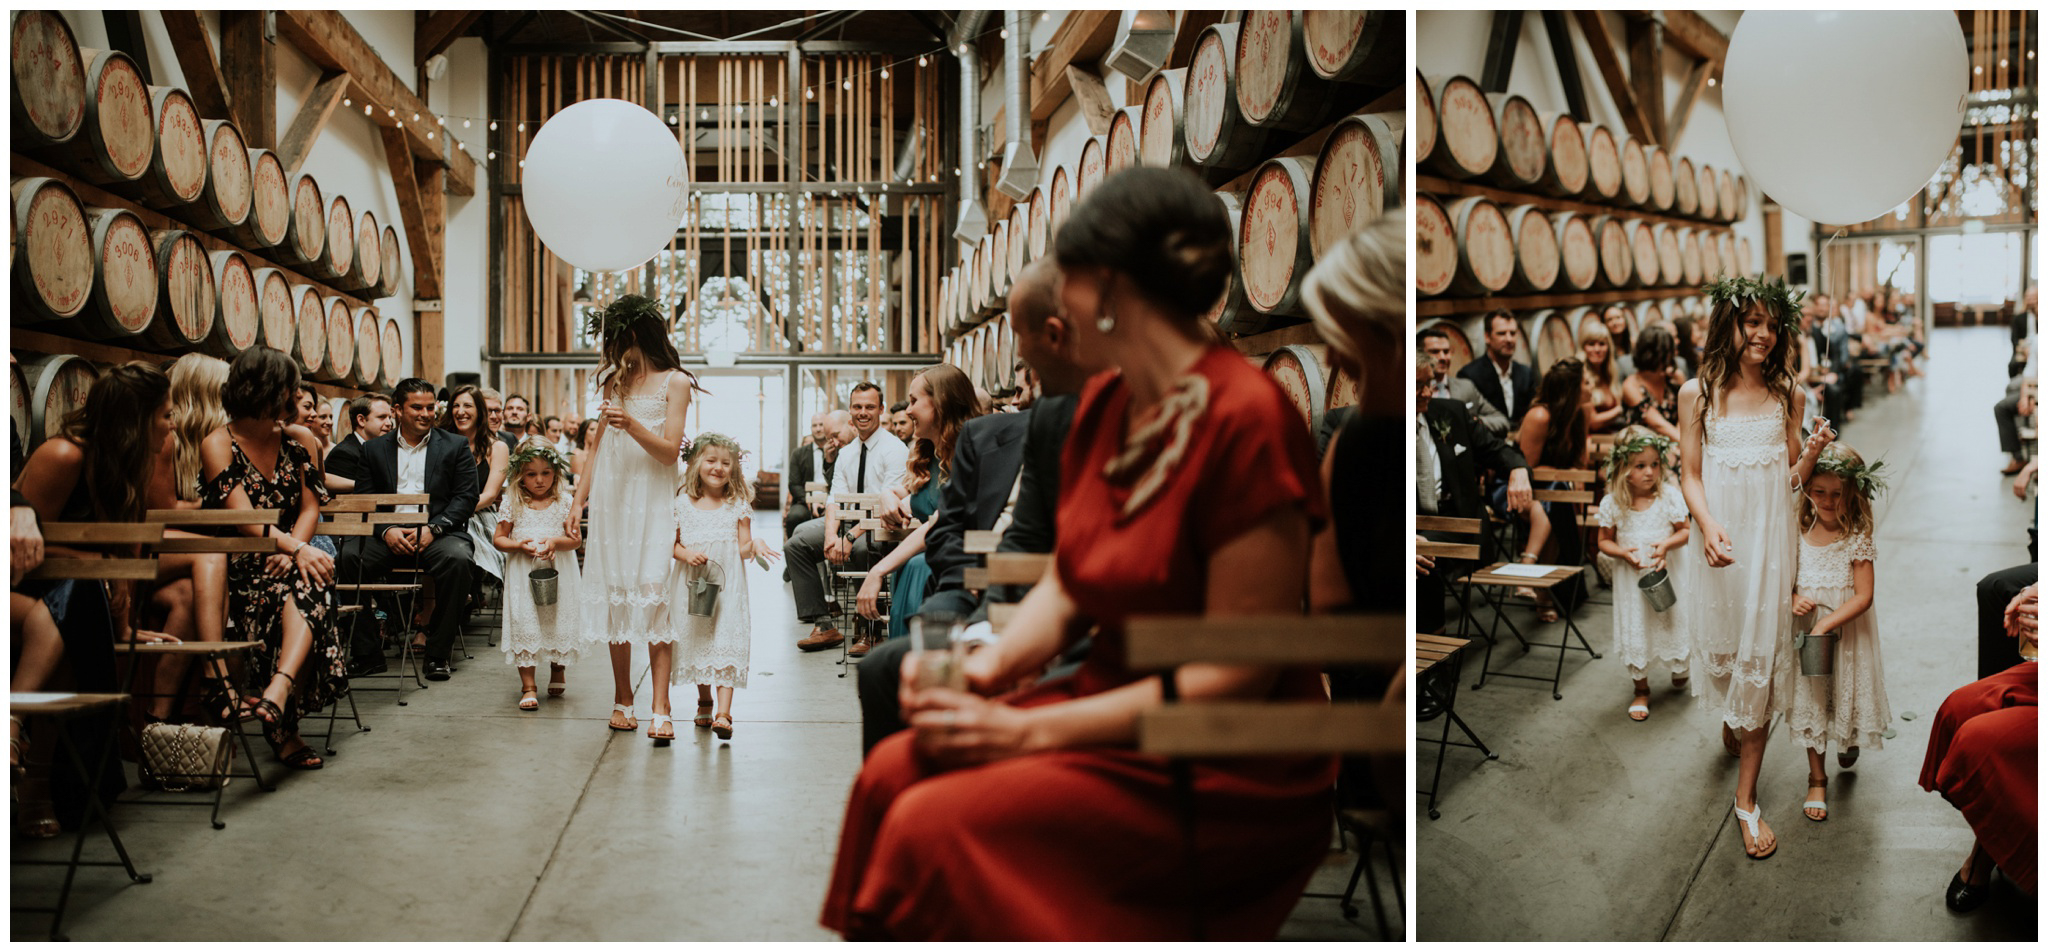 alyssa-keiran-westland-distillery-urban-seattle-wedding-photographer-caitlyn-nikula-108.jpg